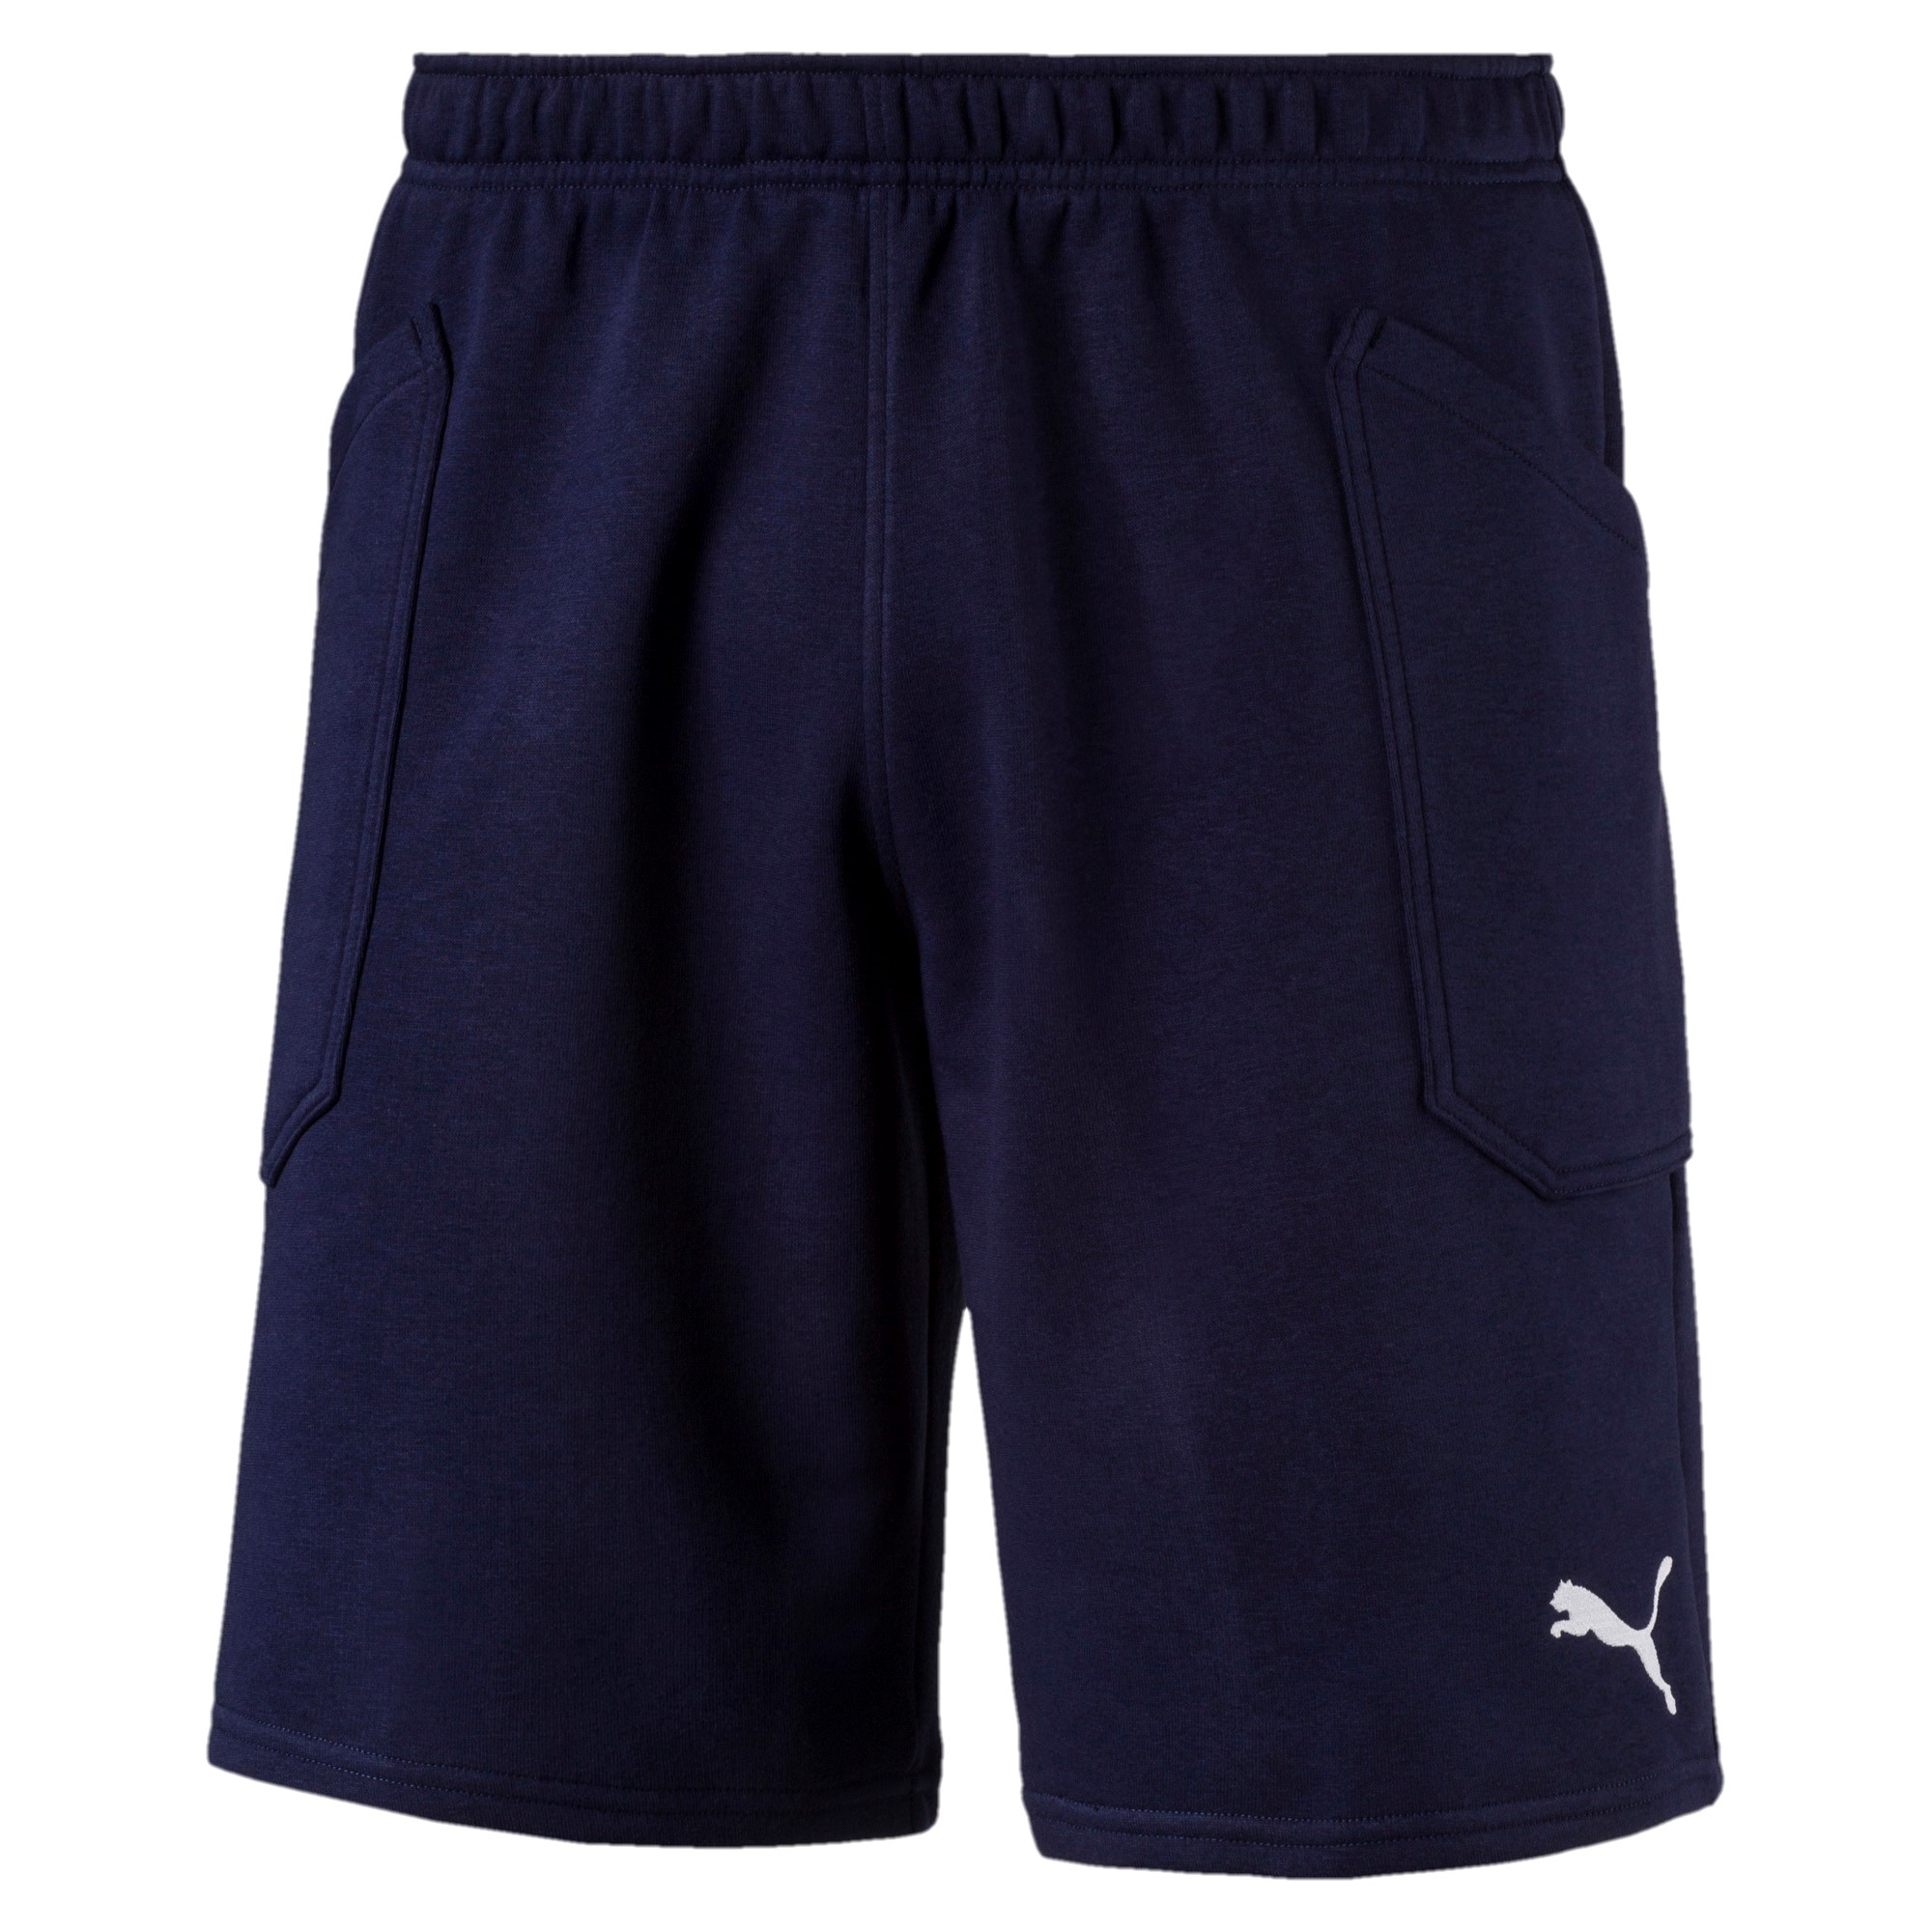 Ligua Casual Short Blue